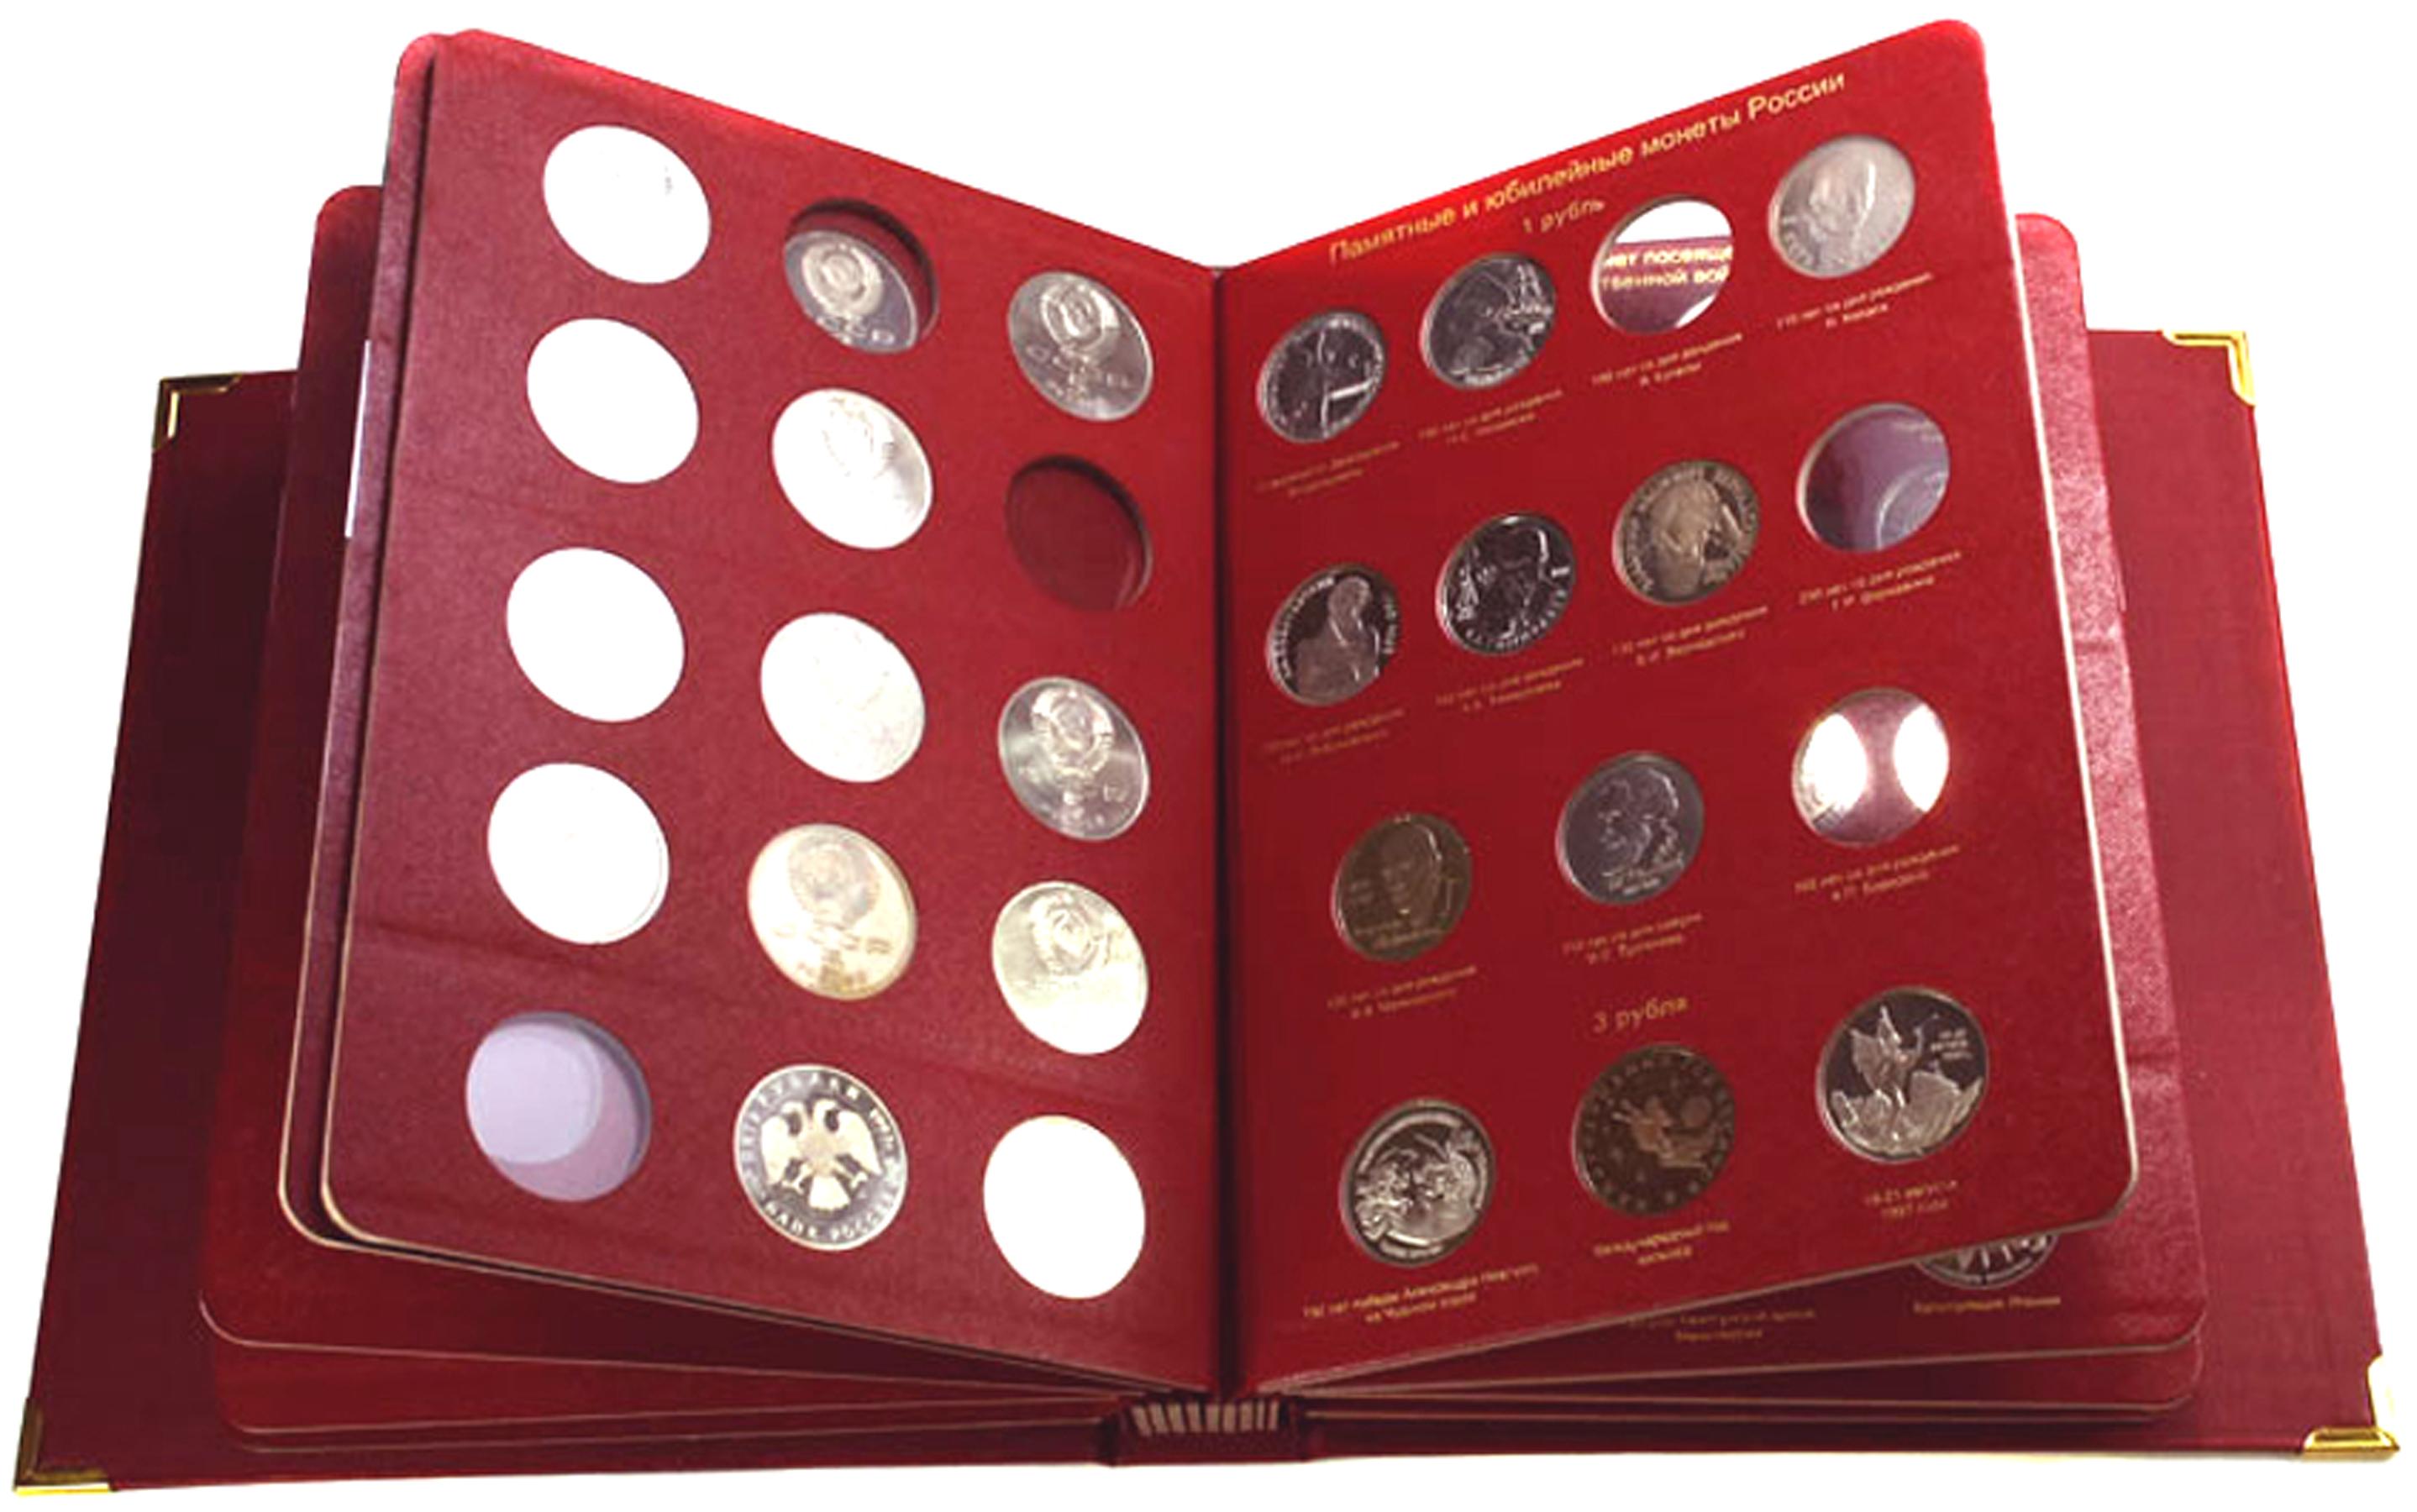 Каталог для монет коллекционеръ ходячка 2014 года